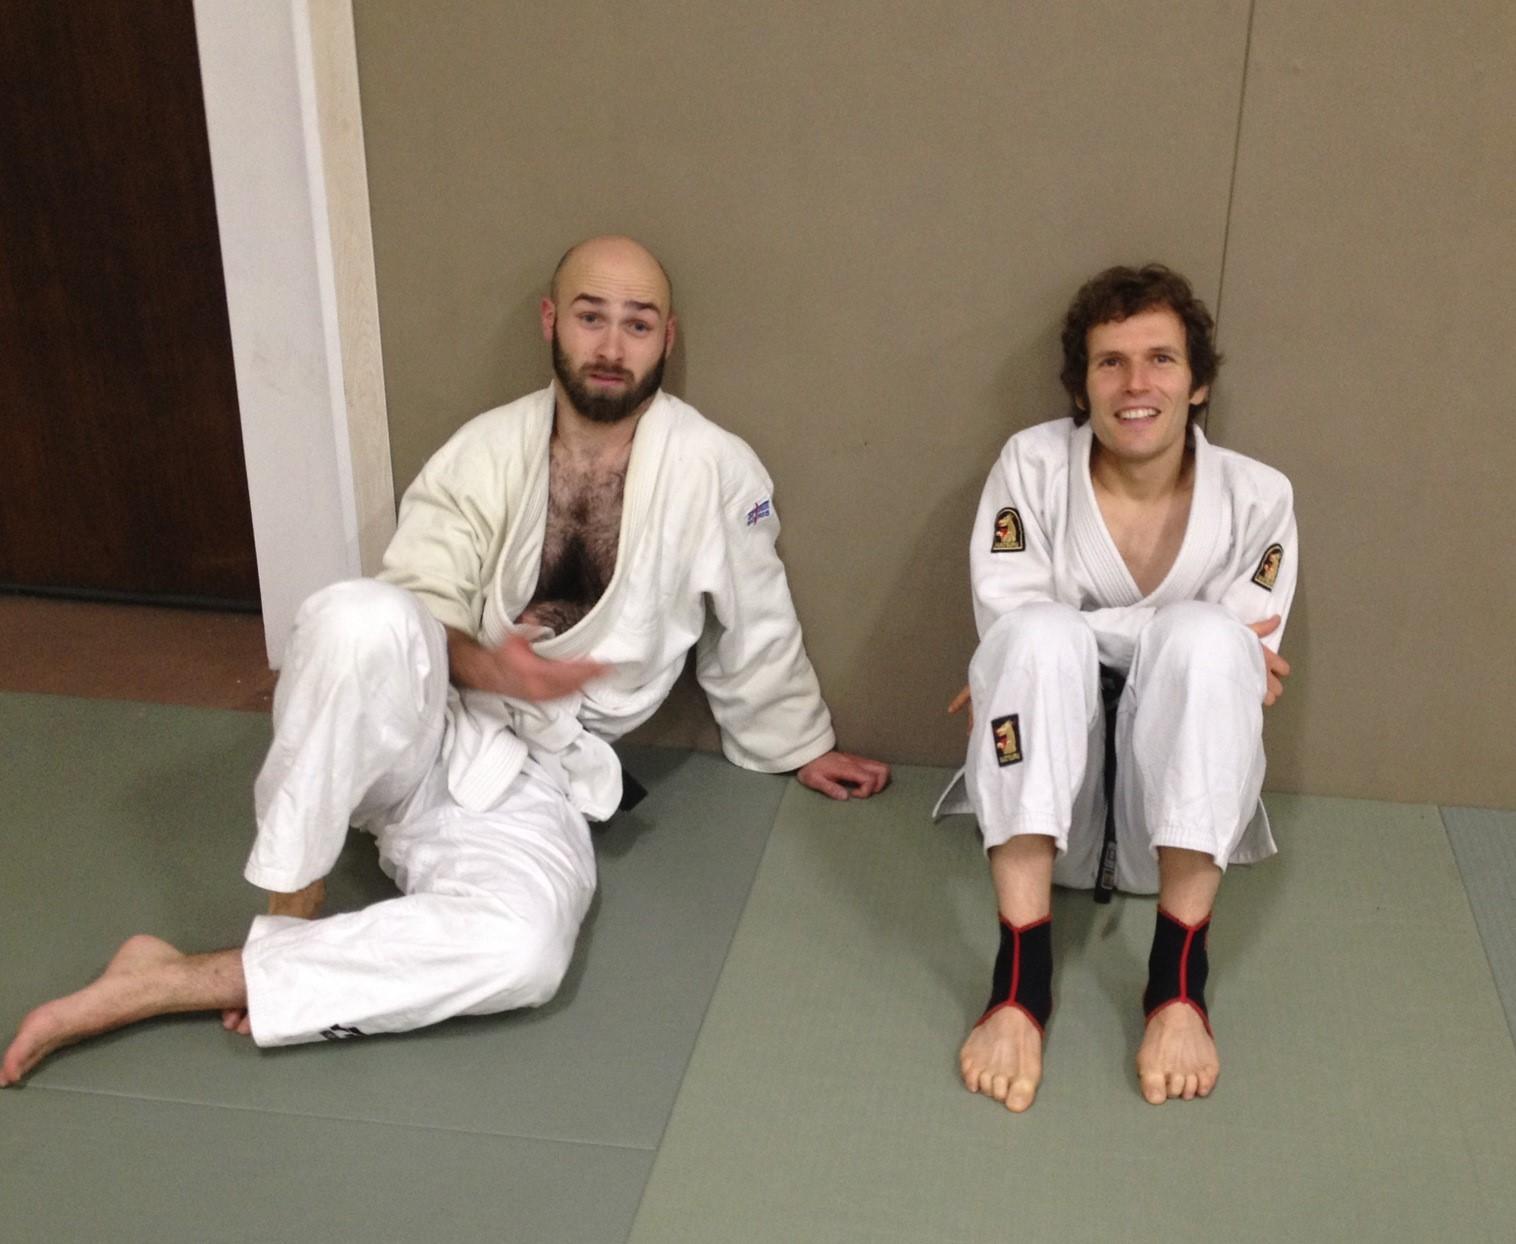 jujitsu-efjjsd-novembre-2013 8